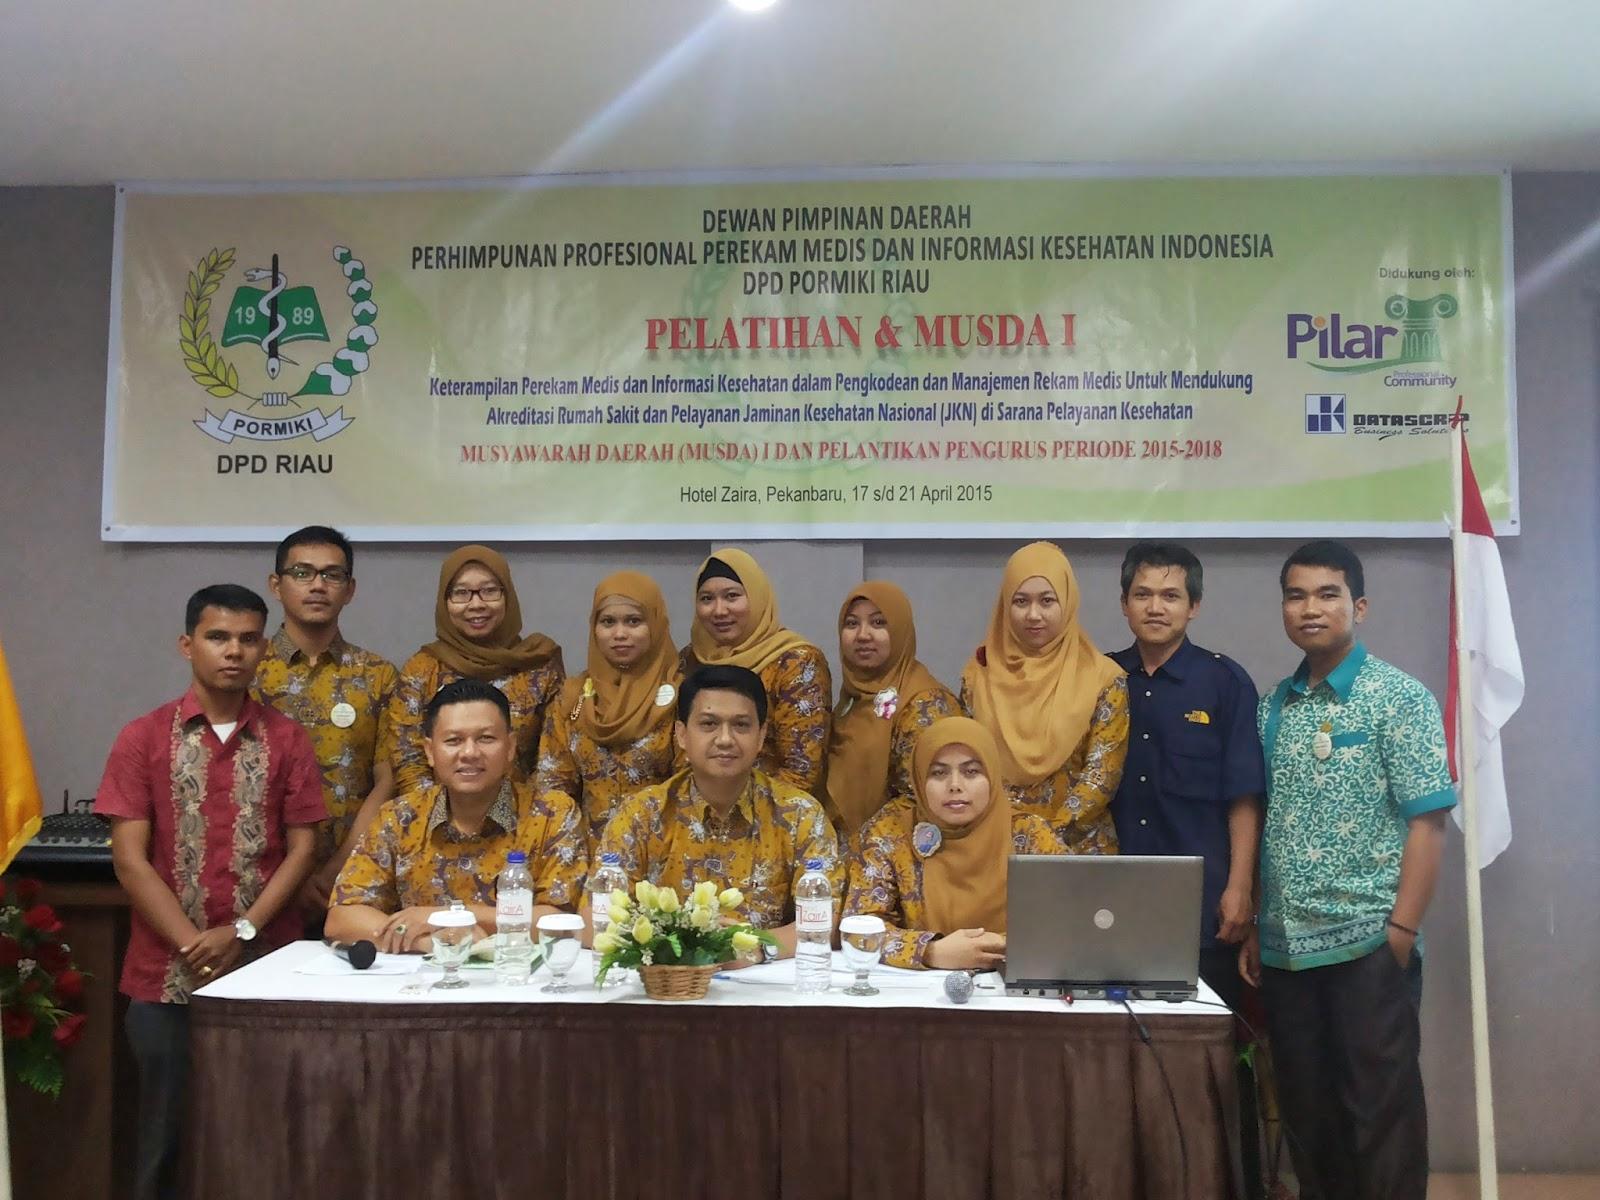 Musyawarah Daerah I DPD PORMIKI Riau Tahun 2015